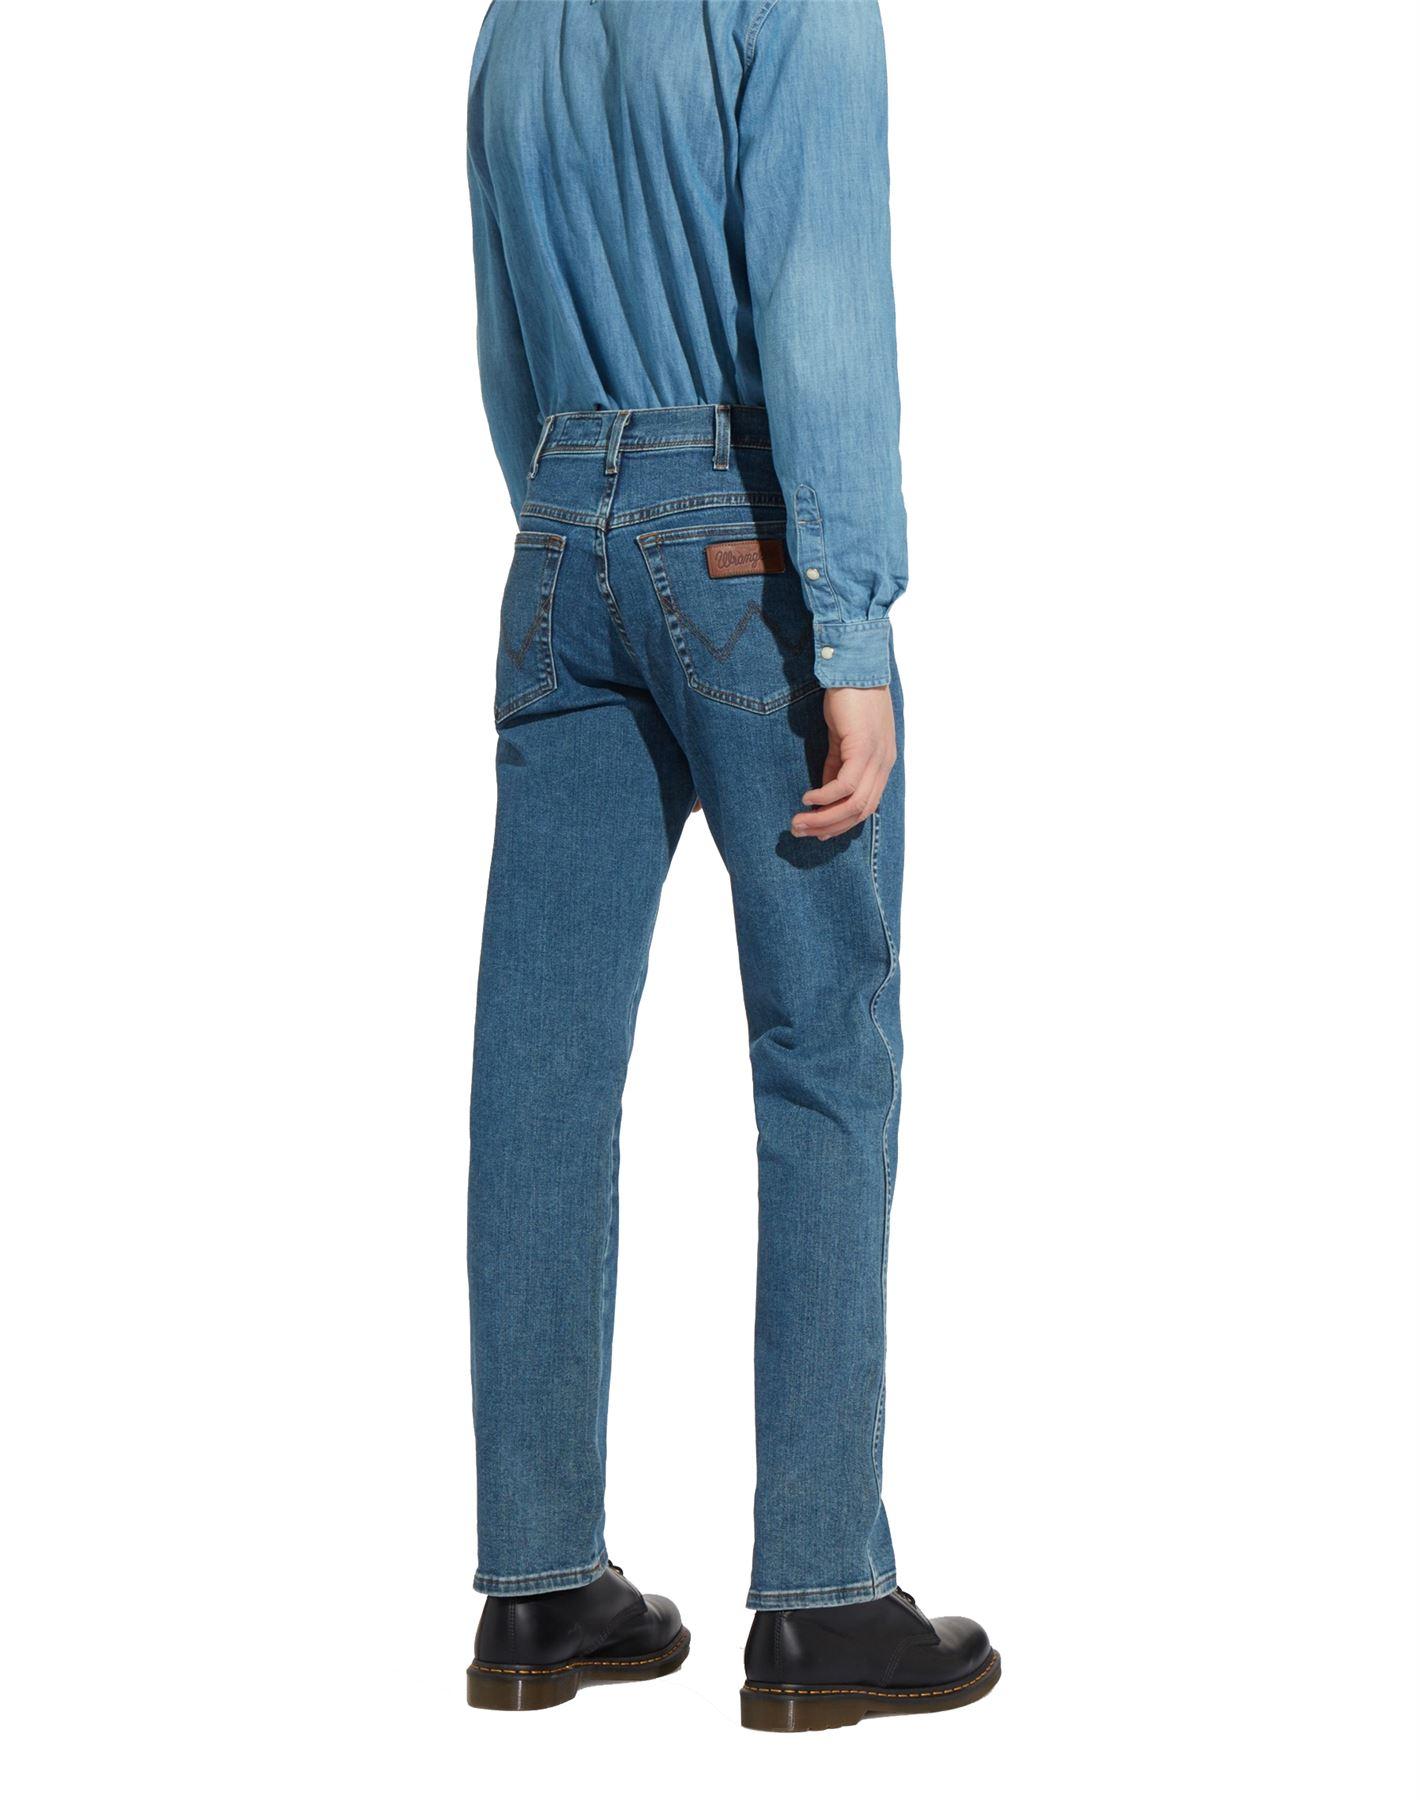 Wrangler Mens Texas Jeans W12133010